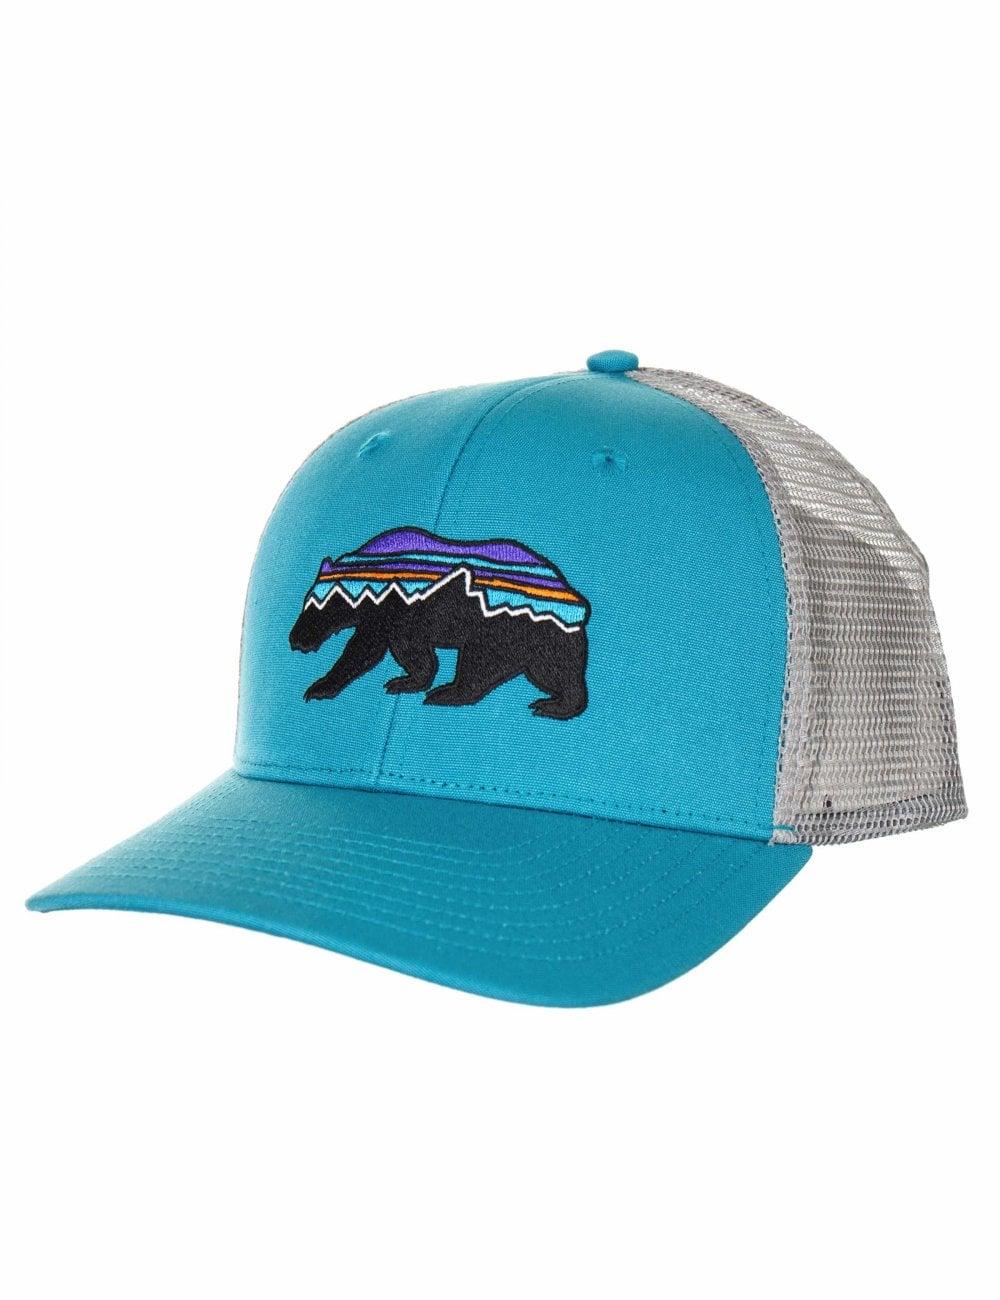 reputable site e3ae9 cfcf1 Patagonia Fitz Roy Bear Trucker Hat - Mako Blue